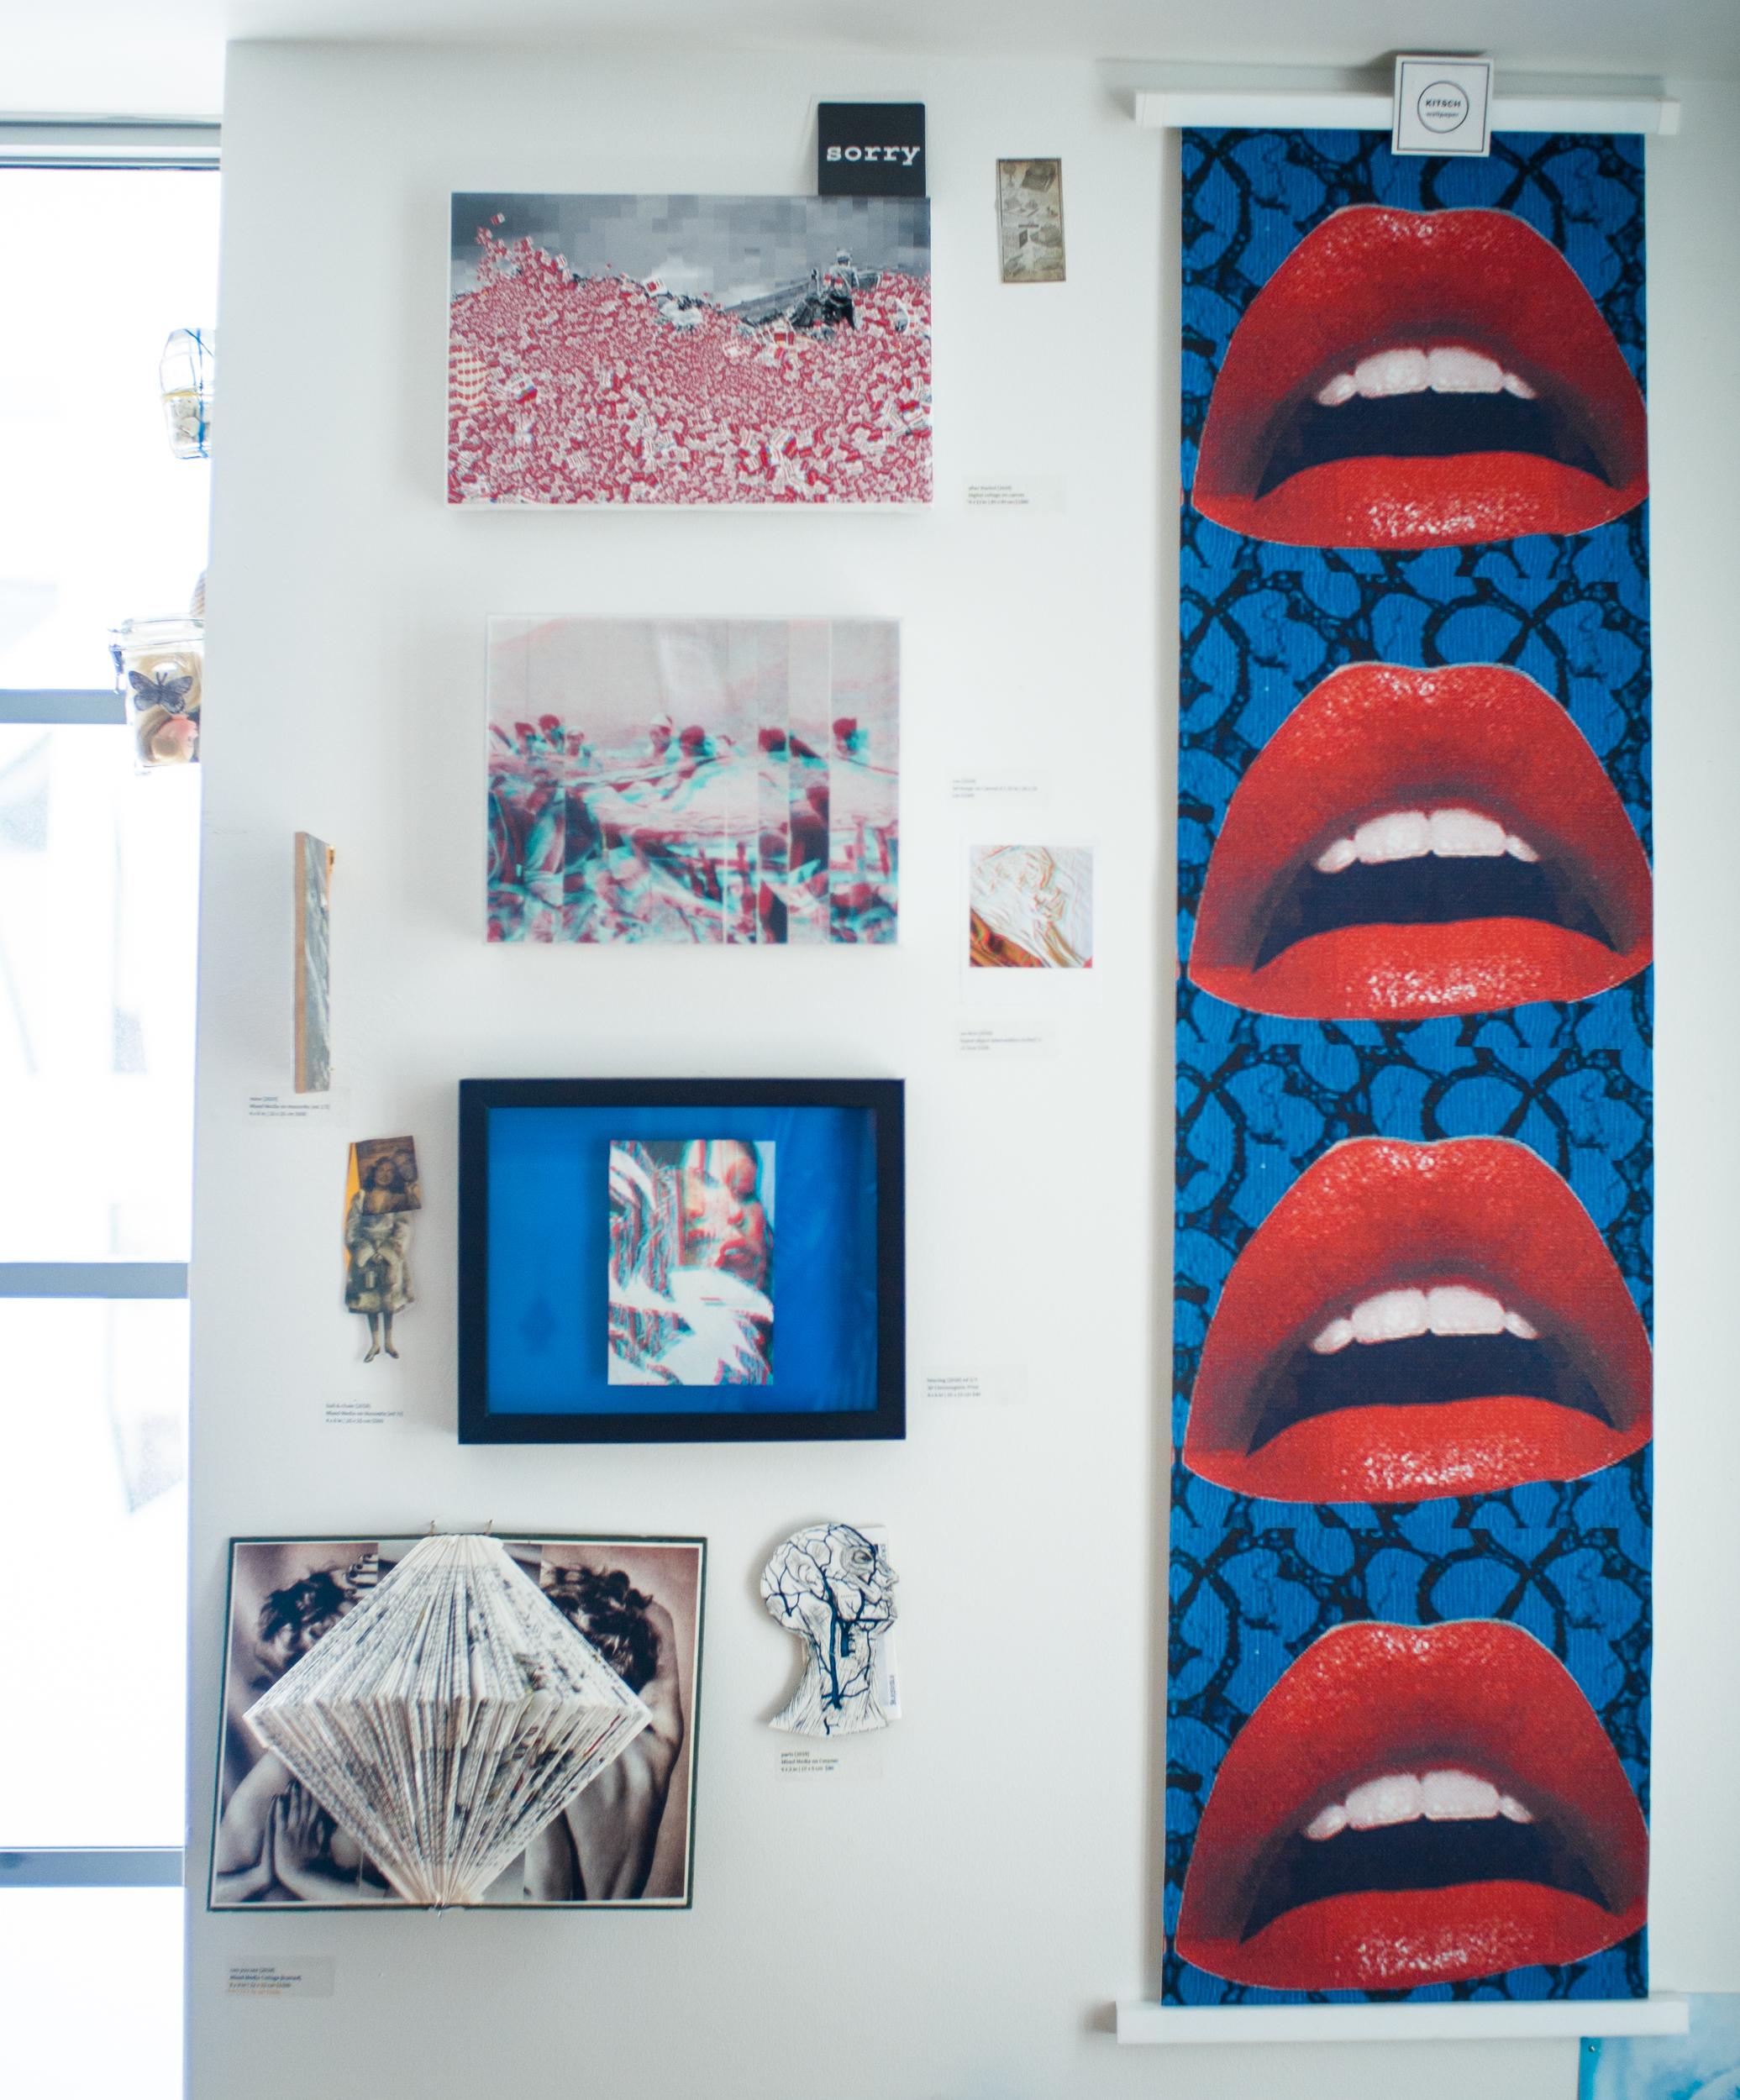 Faena-Exhibition-Images-205.jpg